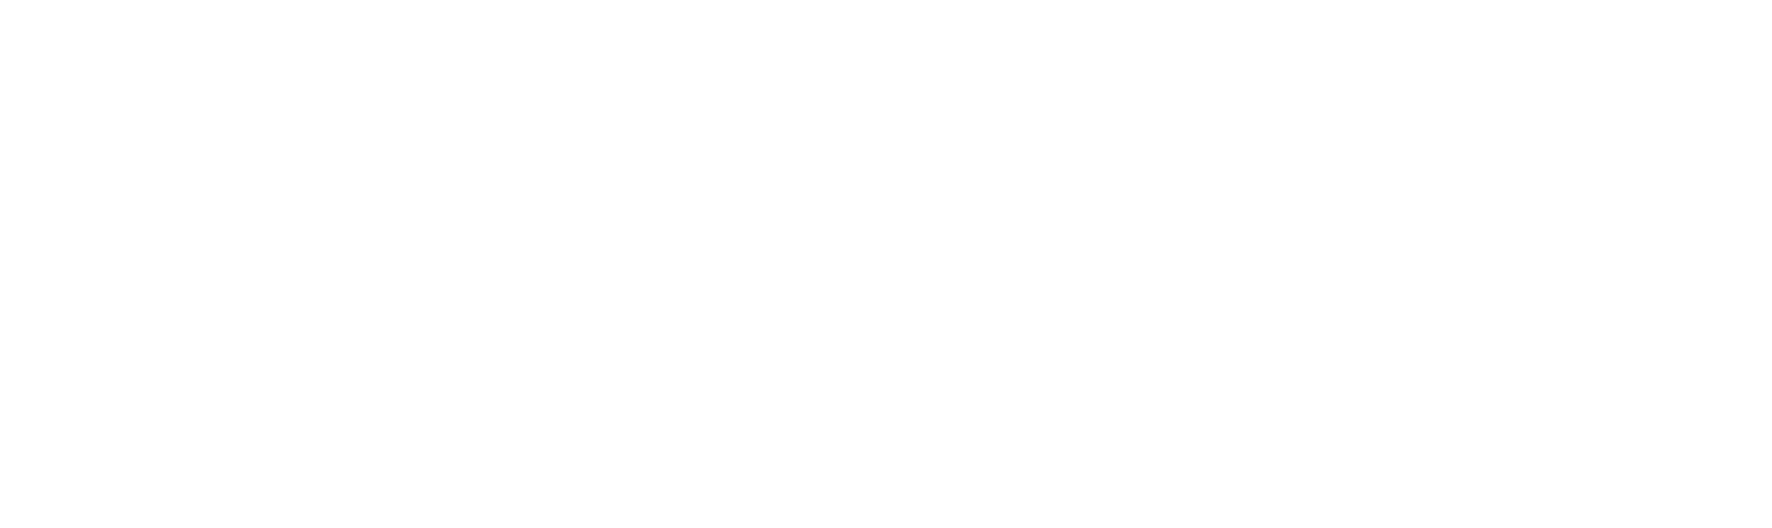 HUB 12